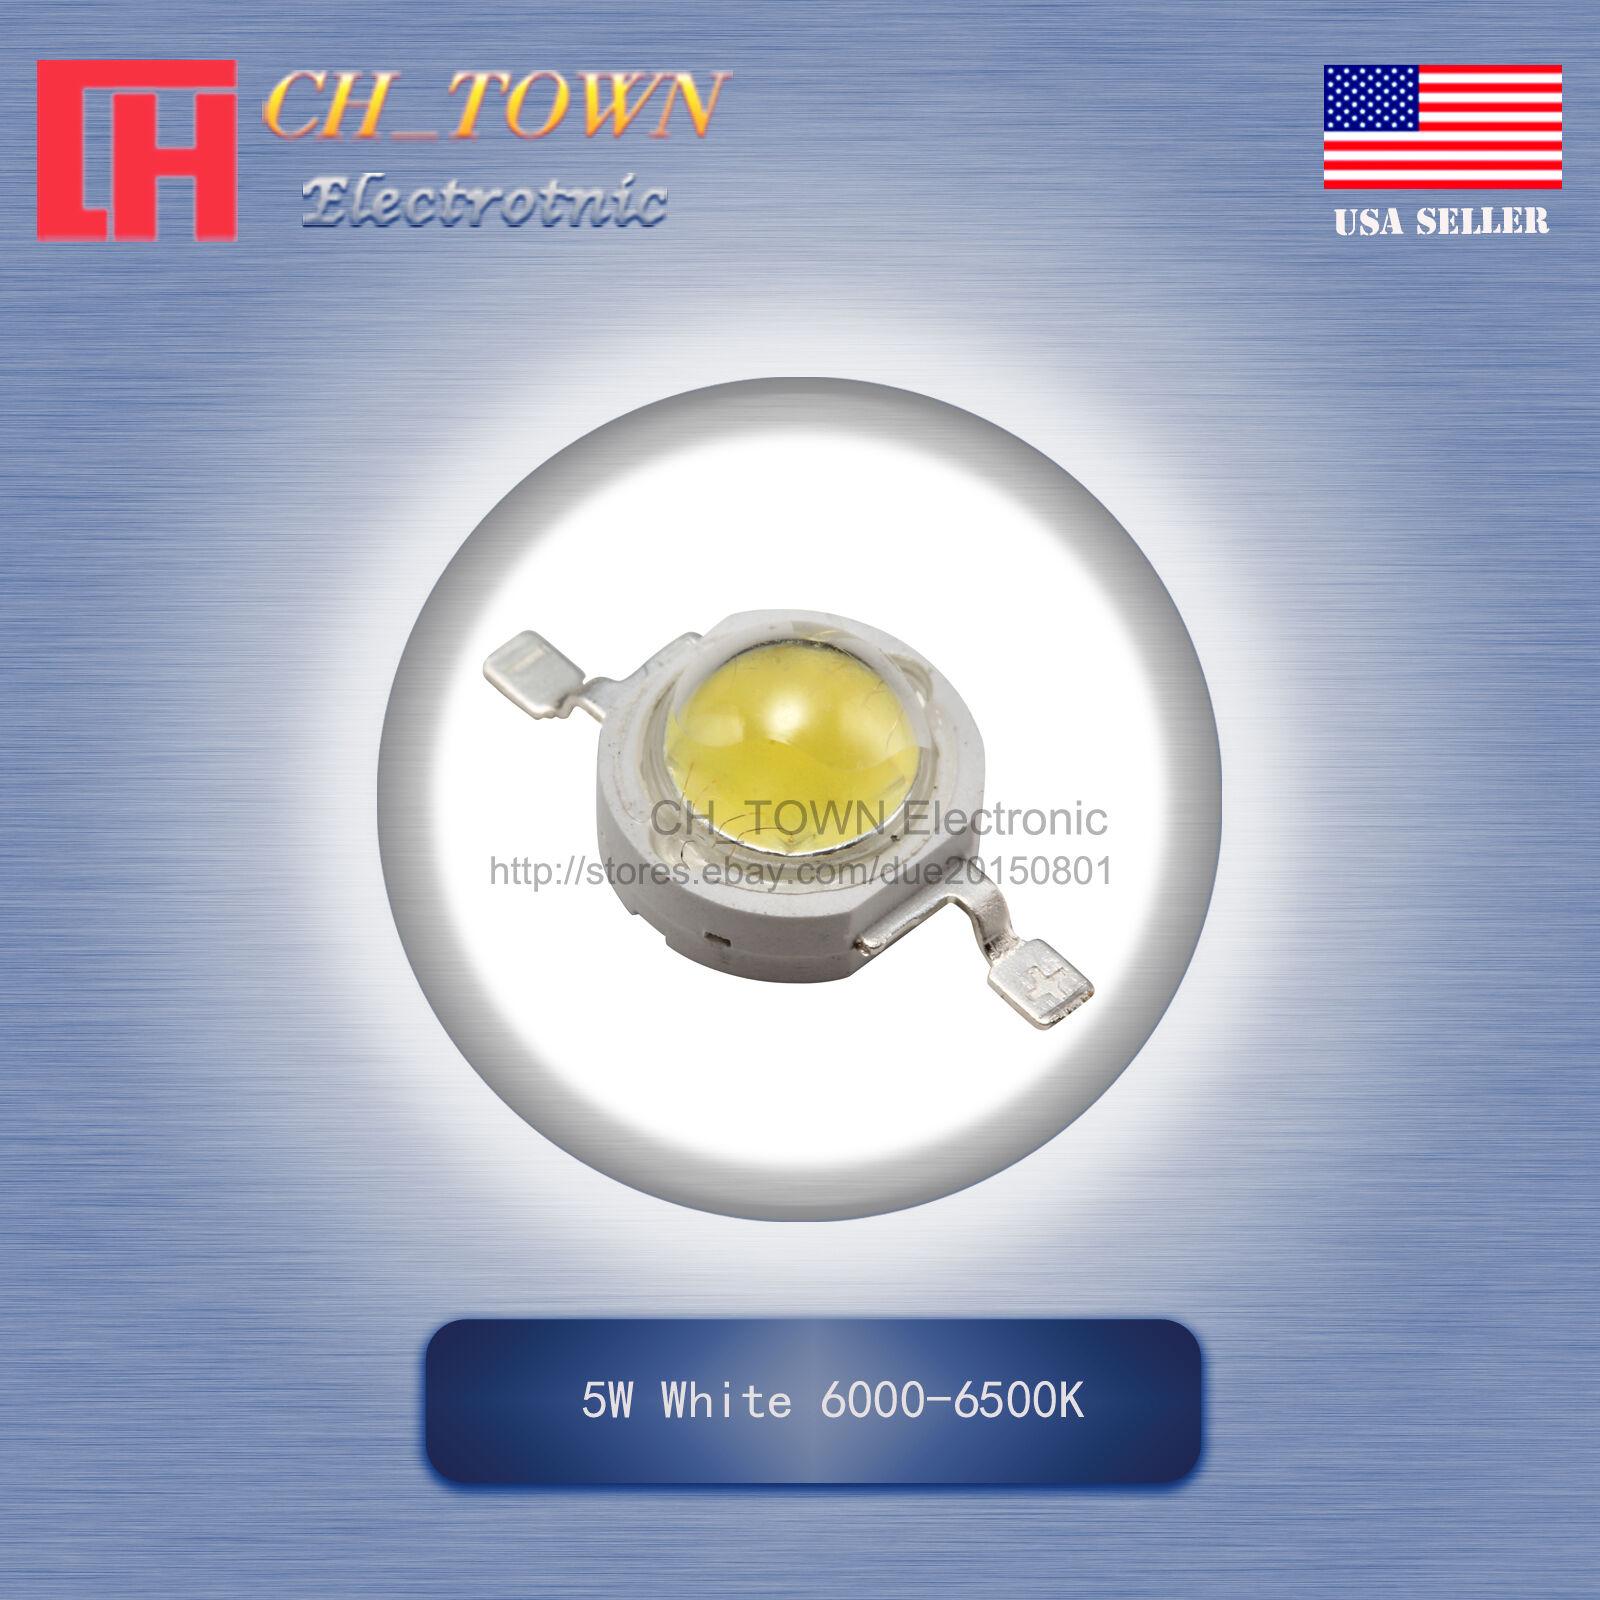 2000Pcs 3W vatios Alta Potencia Azul 460-470nm placa de circuito impreso